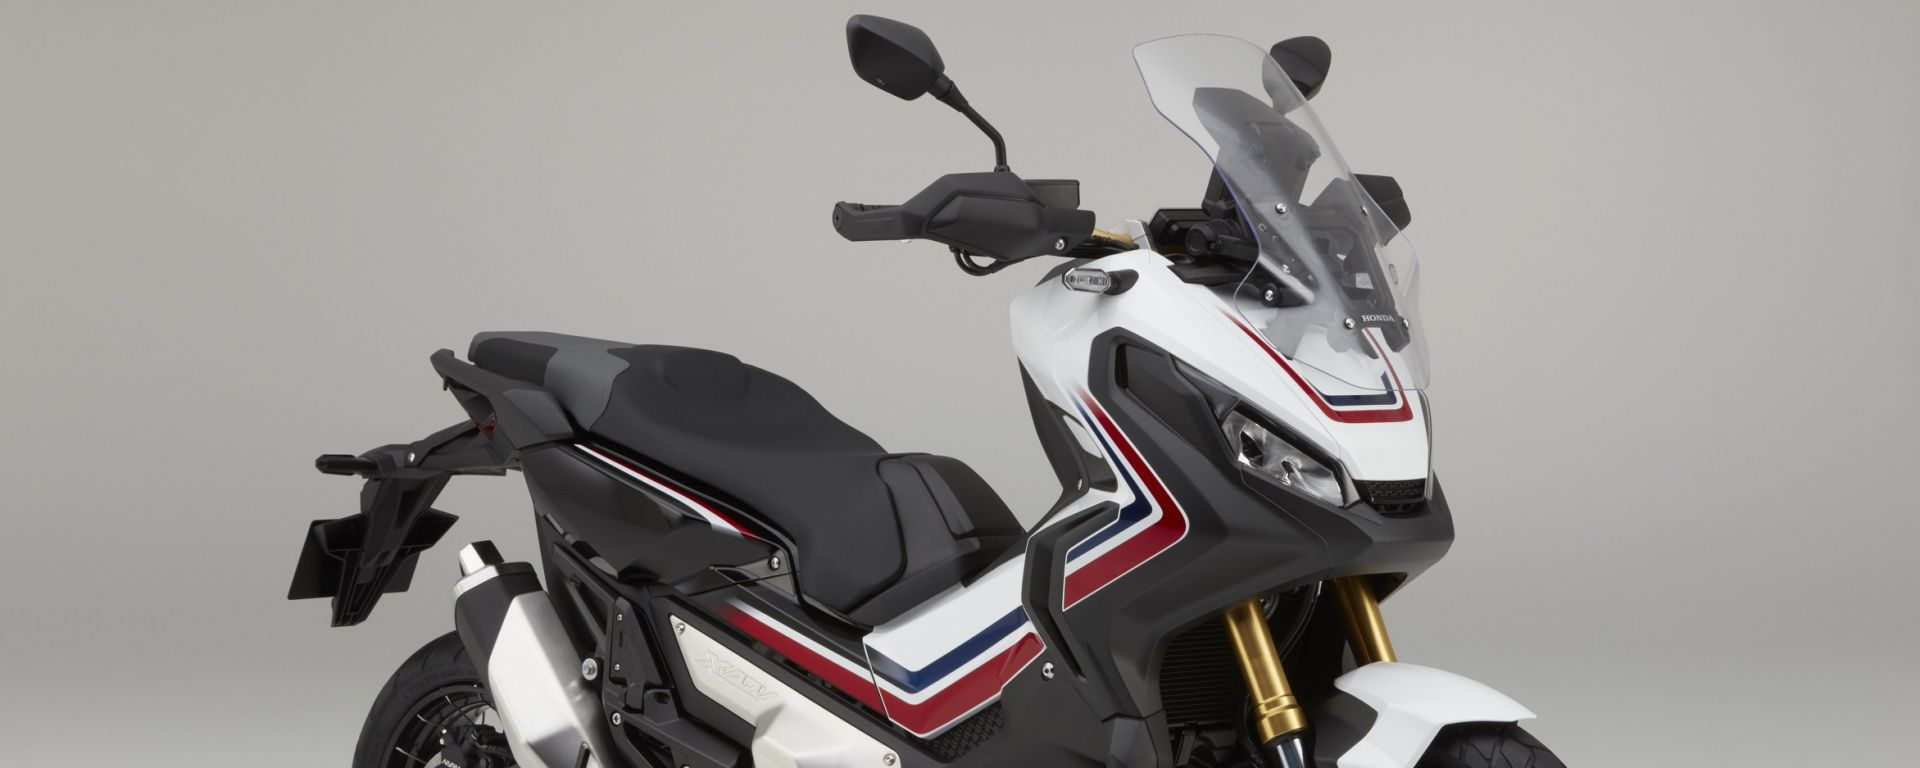 Eicma 2016: Honda X-ADV, lo scooter avventuroso - MotorBox